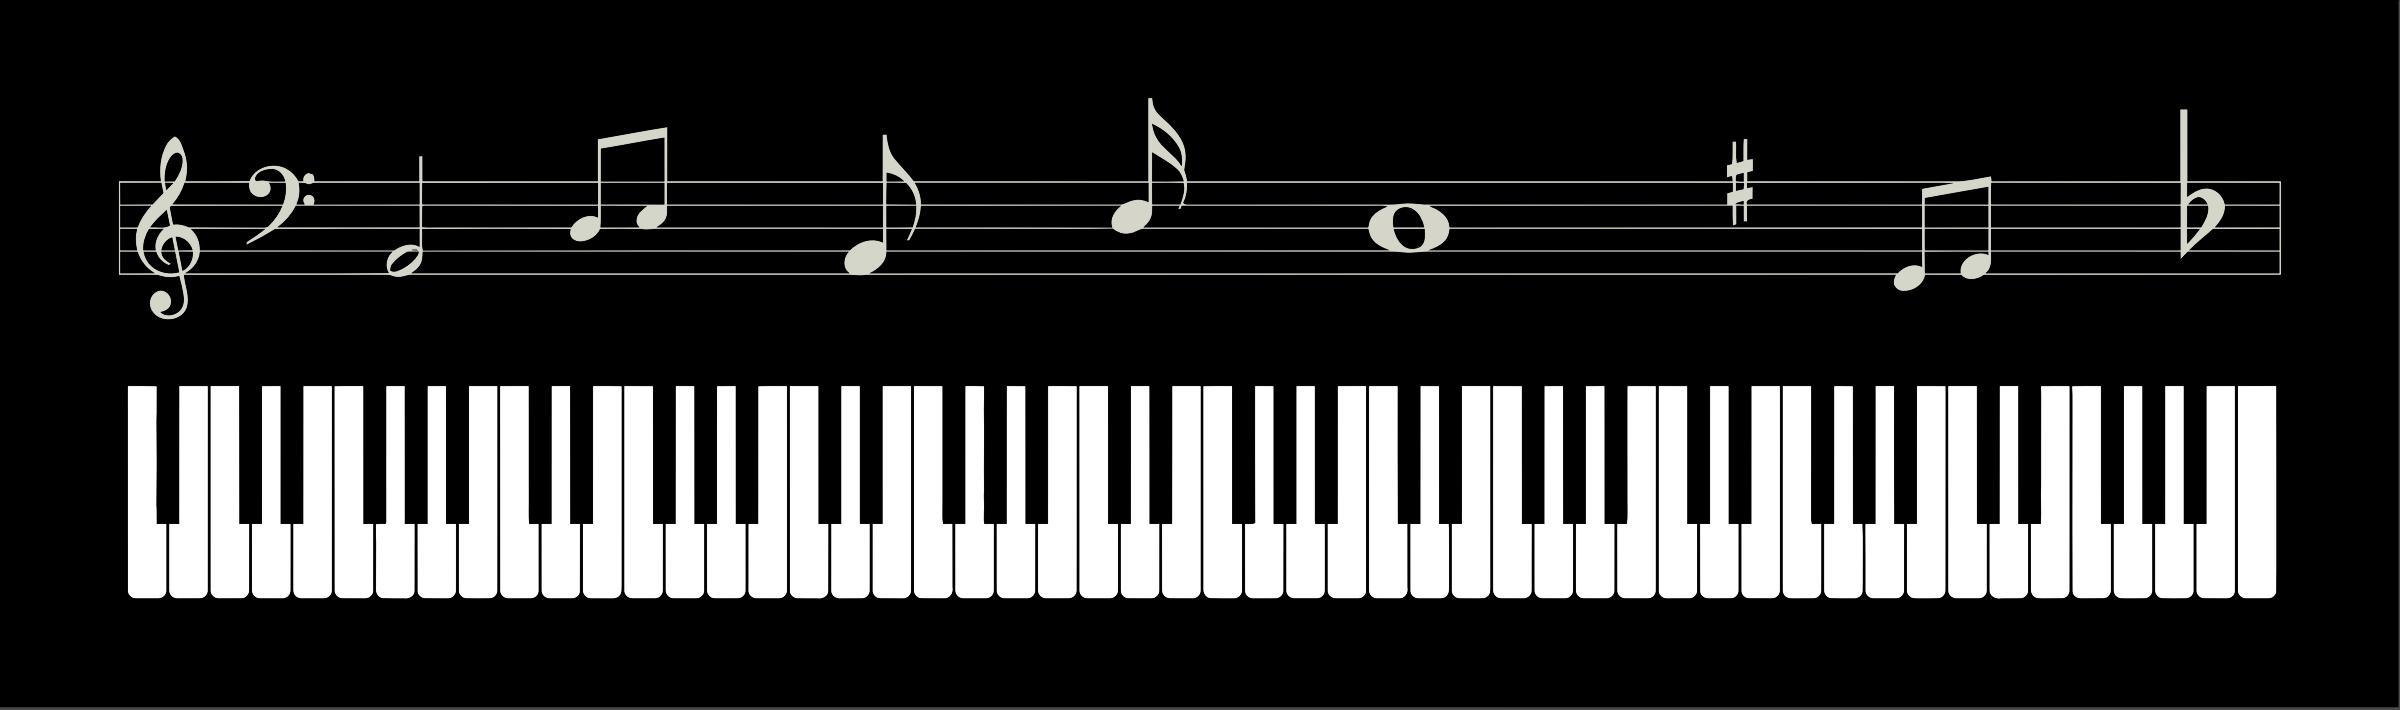 Free Piano Keys Cliparts, Download Free Clip Art, Free Clip.